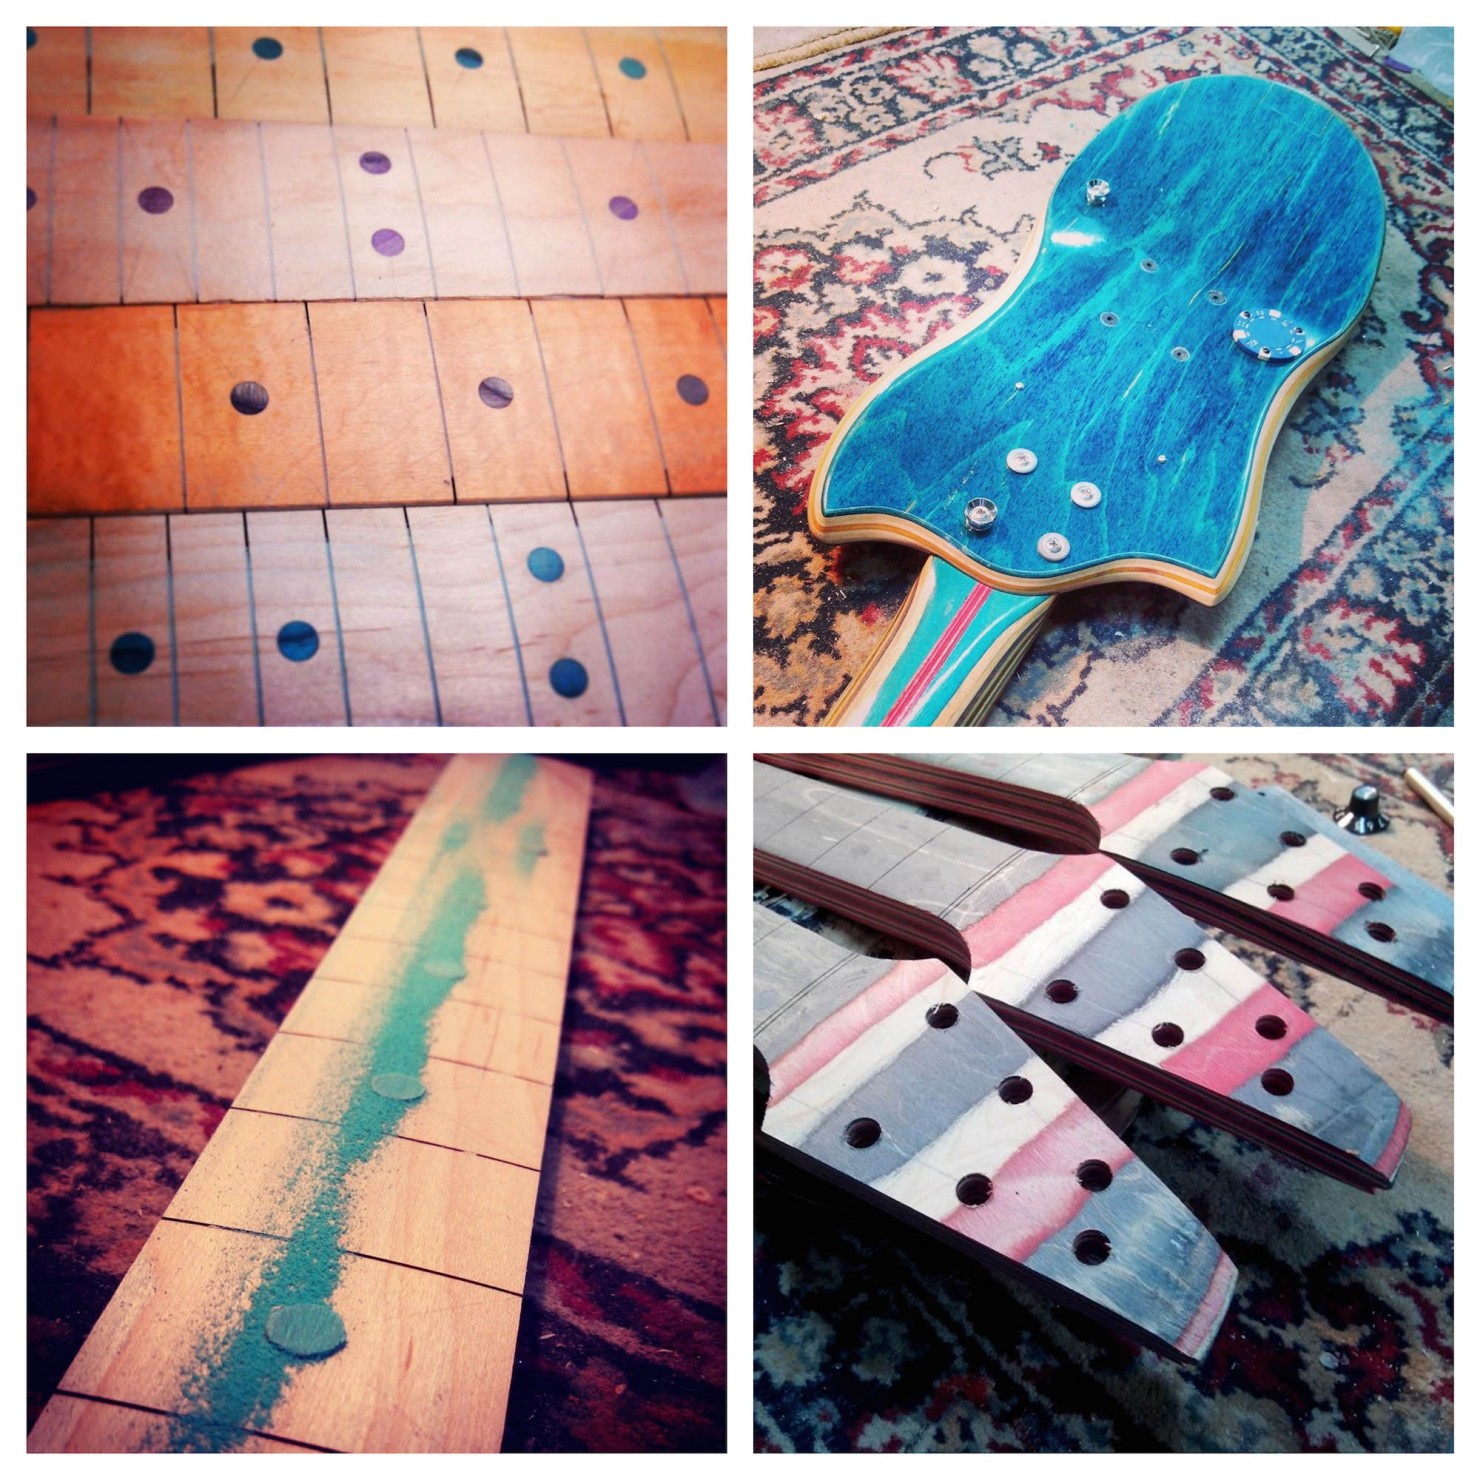 Skateboard_Guitars_1_Collage